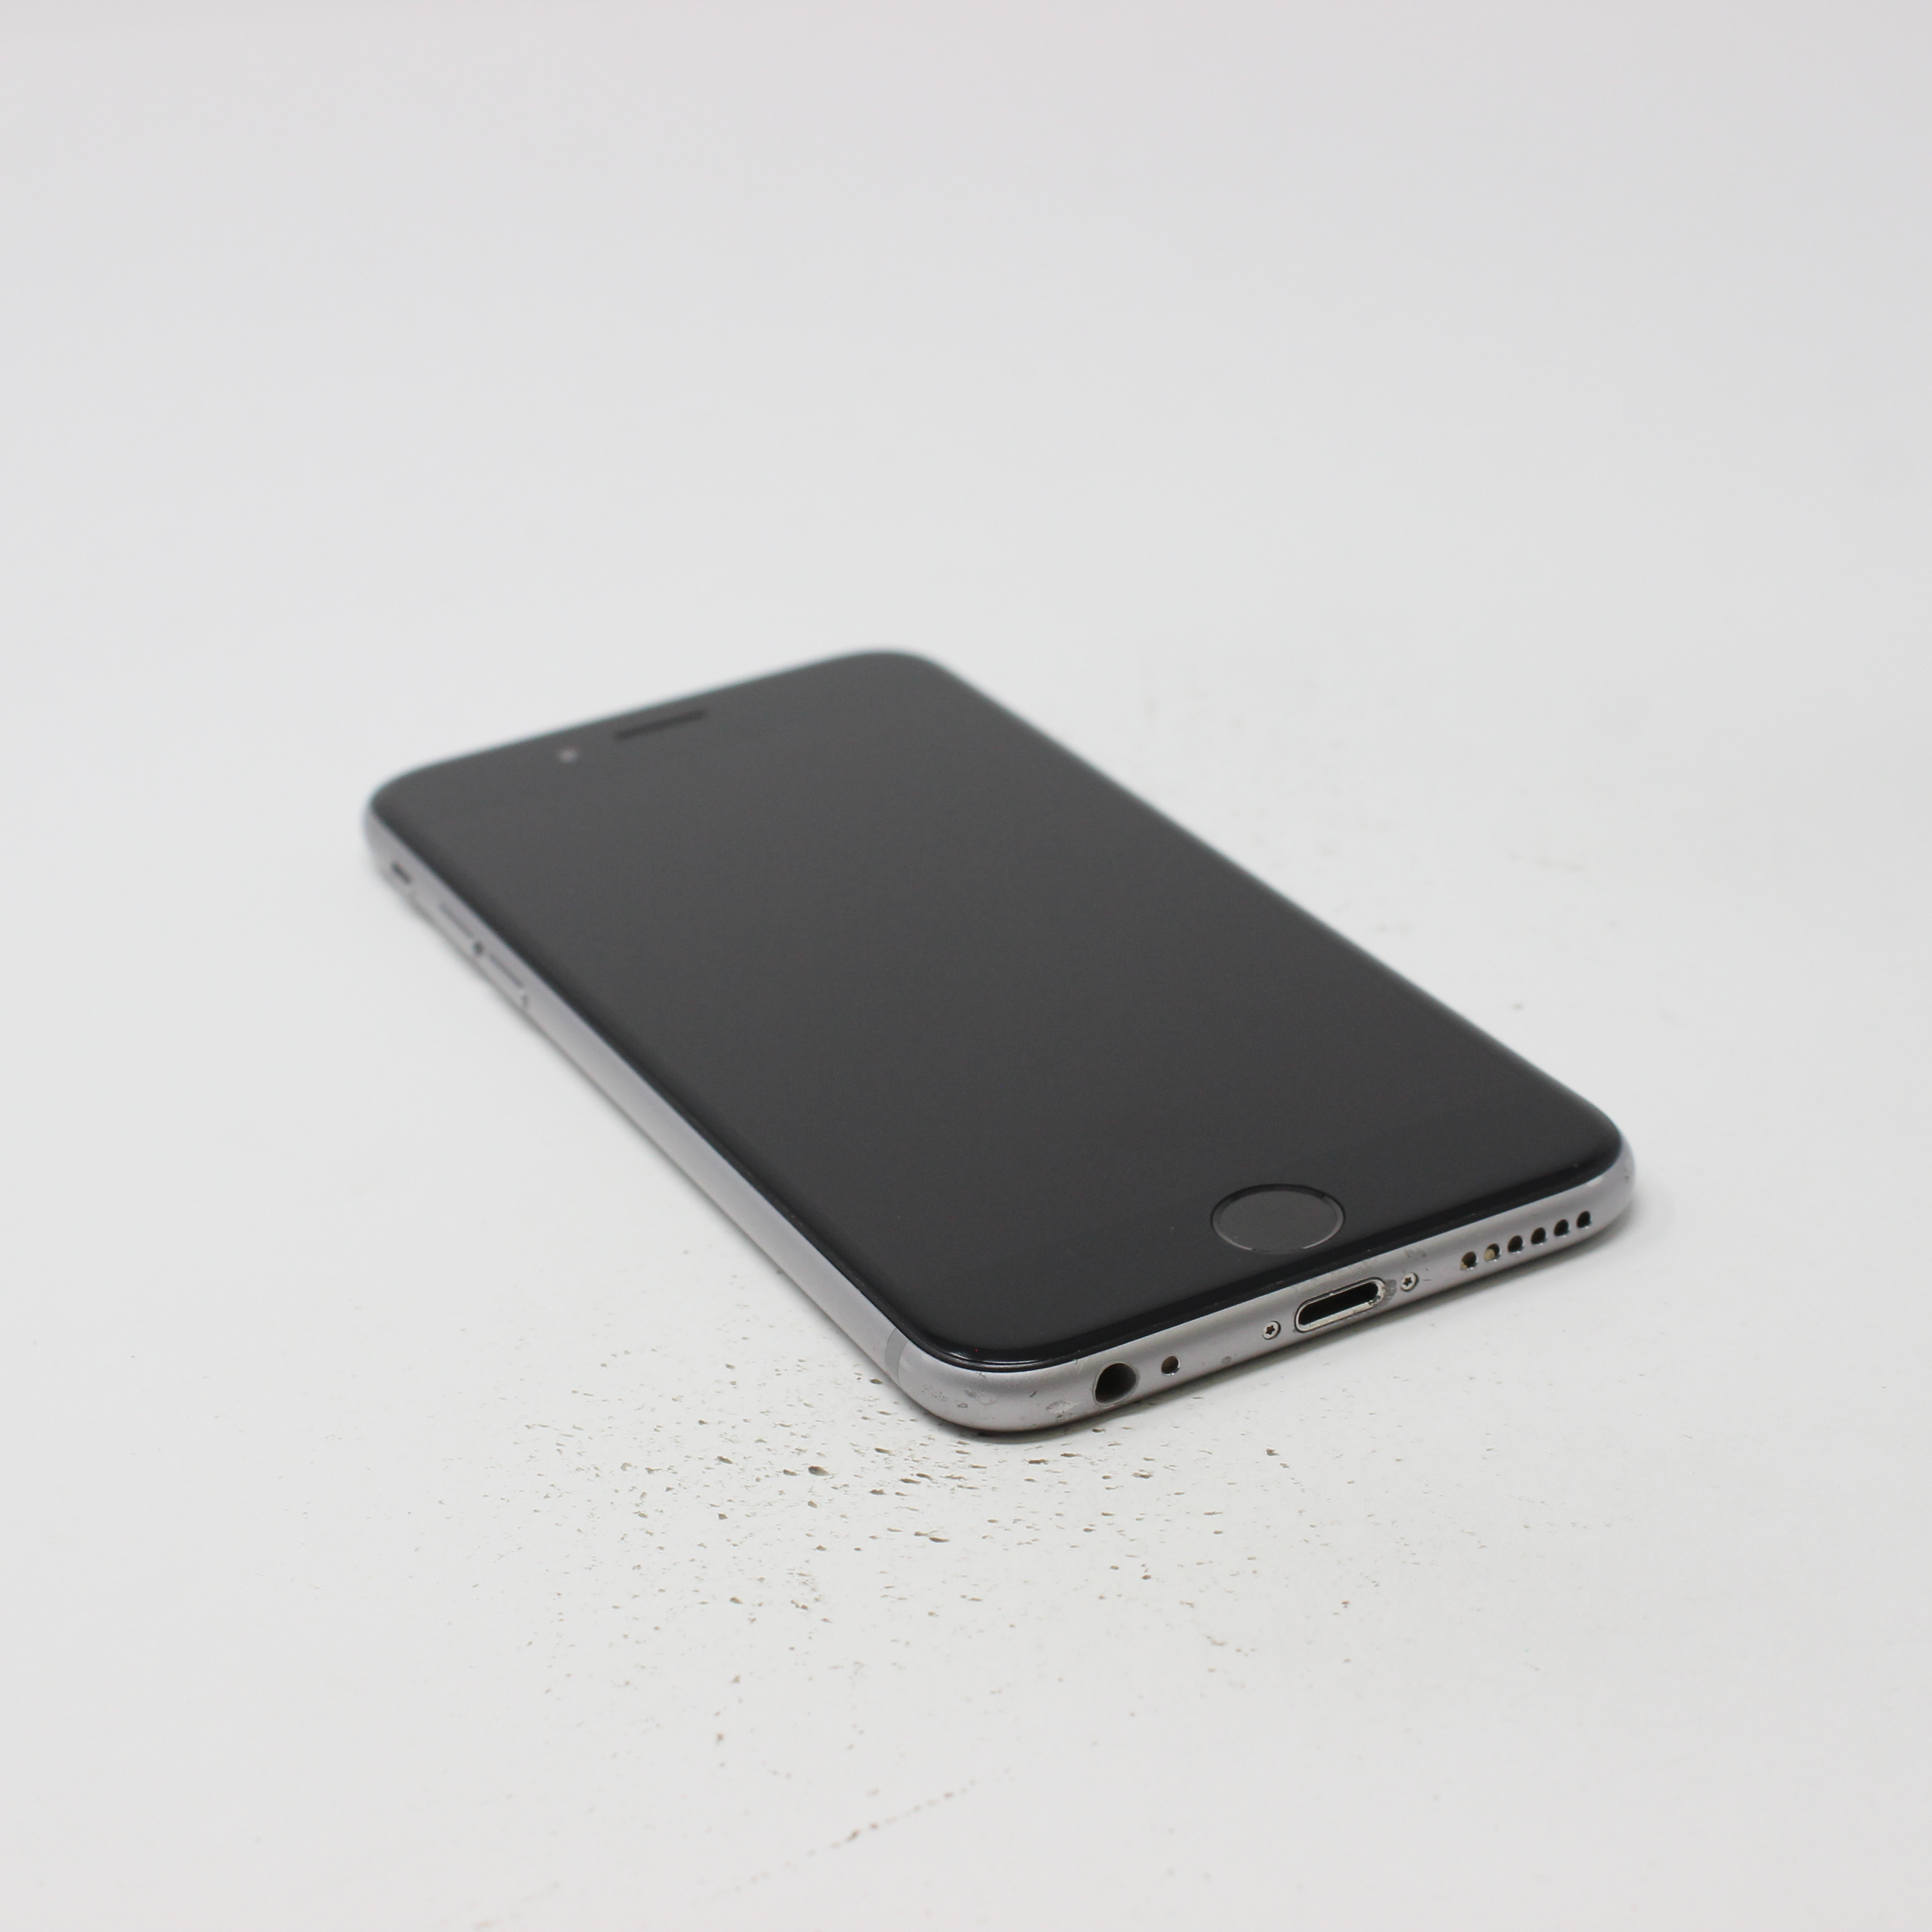 iPhone 6S 16GB Space Gray - Verizon photo 5   UpTradeit.com